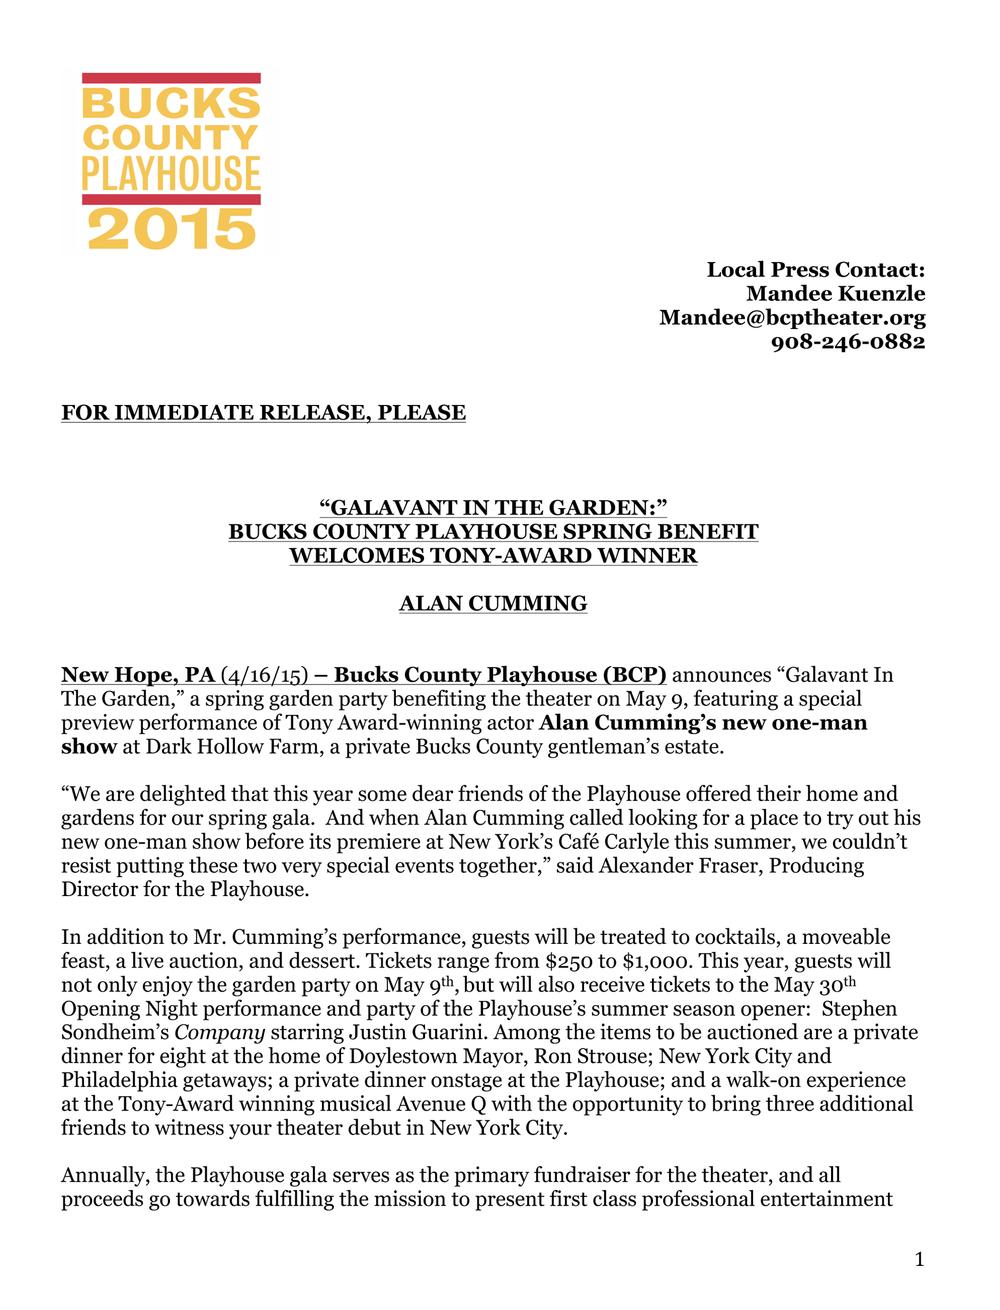 BCP GALA 2015 RELEASE_FINAL-1.jpg